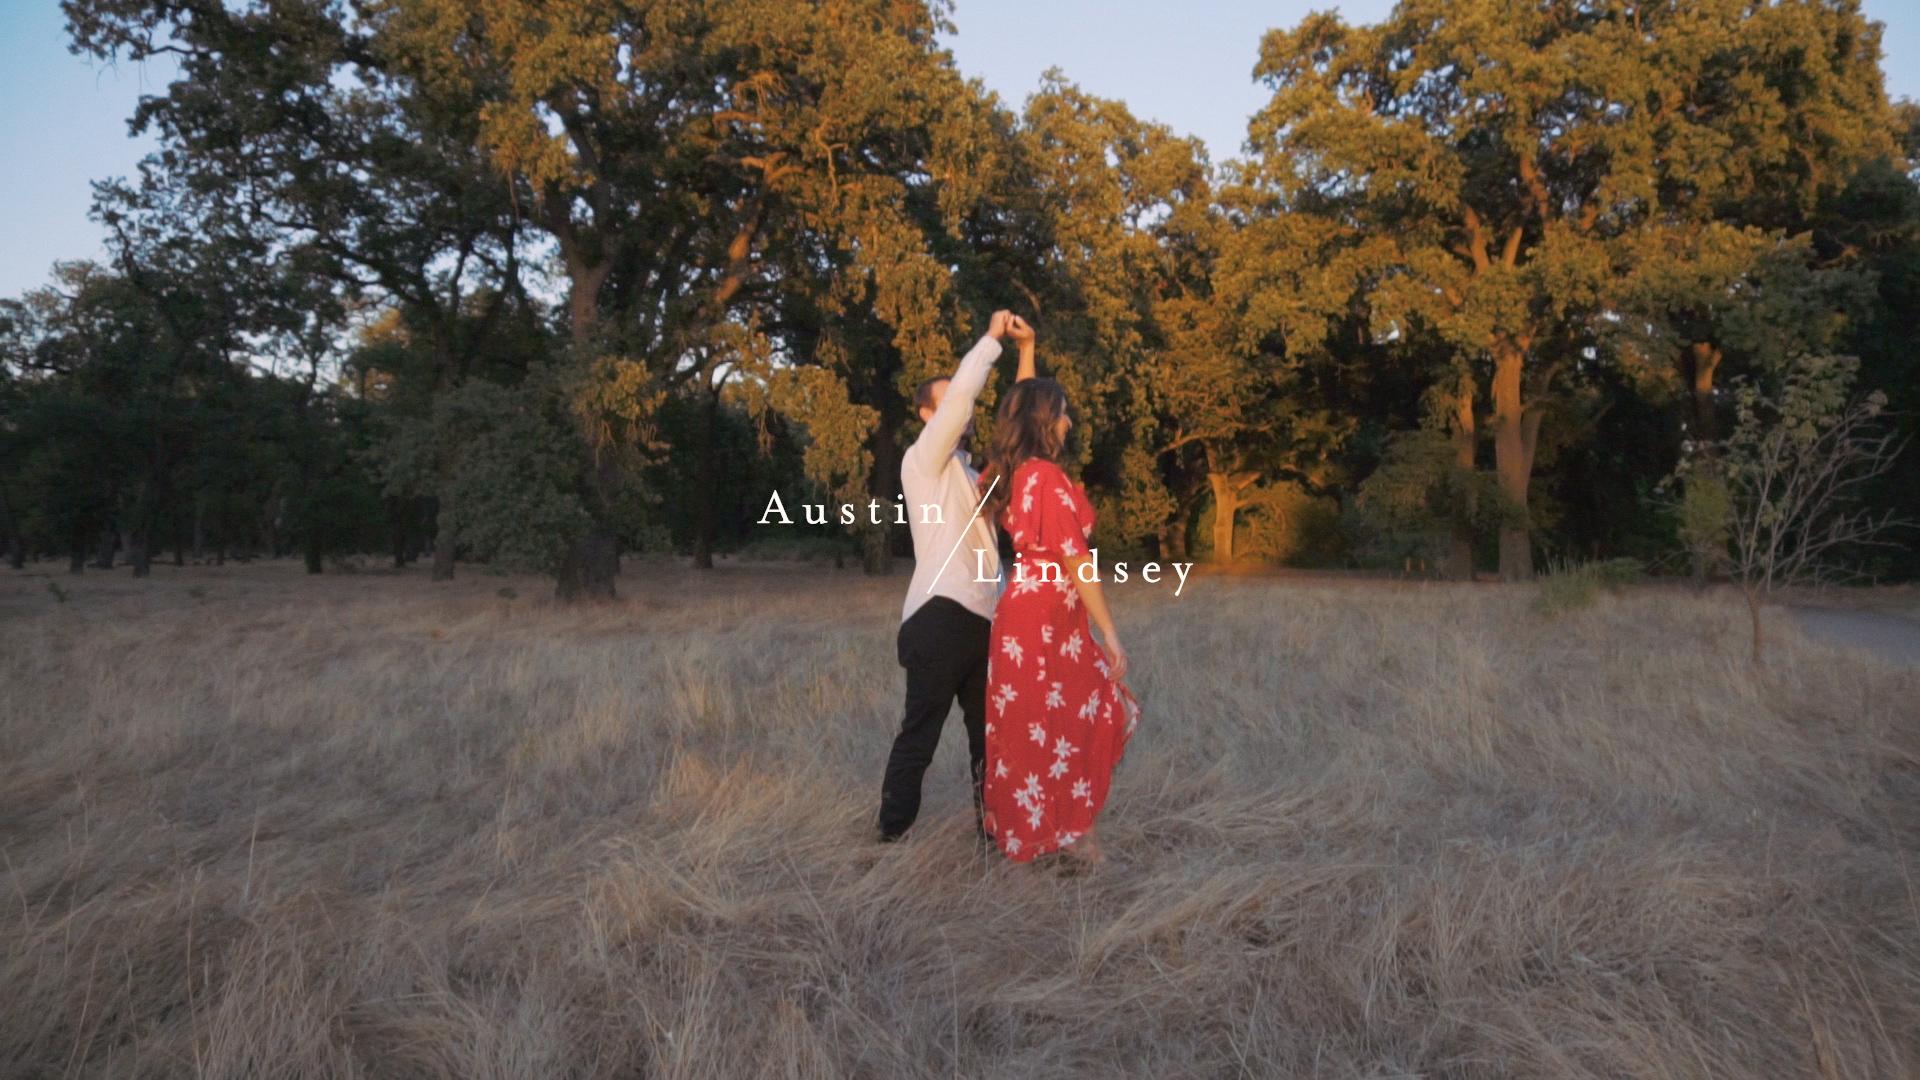 Austin + Lindsey | Ripon, California | Park